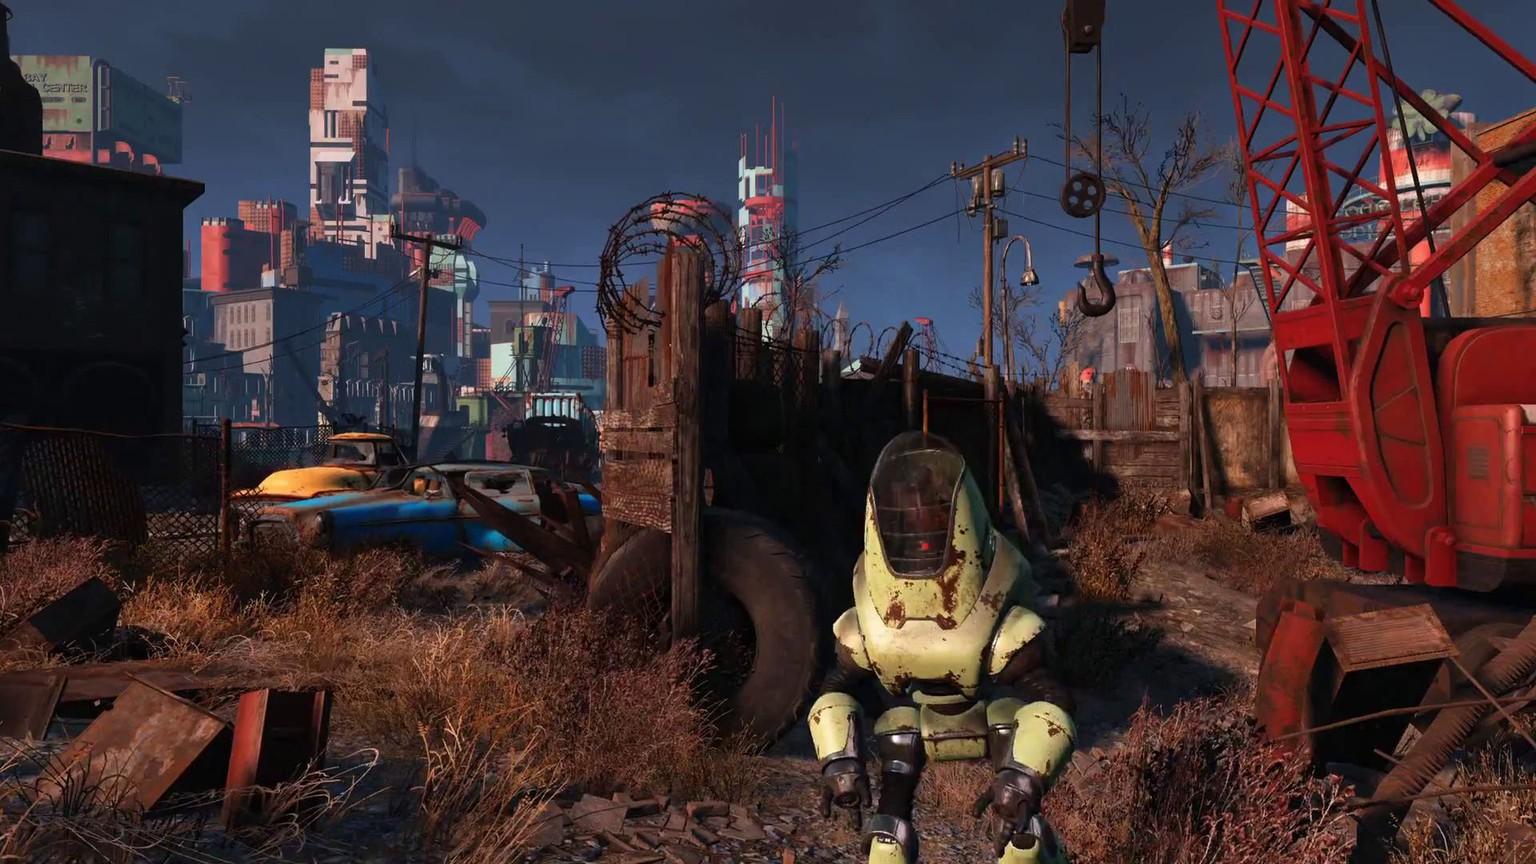 29 Survival Tipps Fur Das Postapokalypse Game Fallout 4 Watson